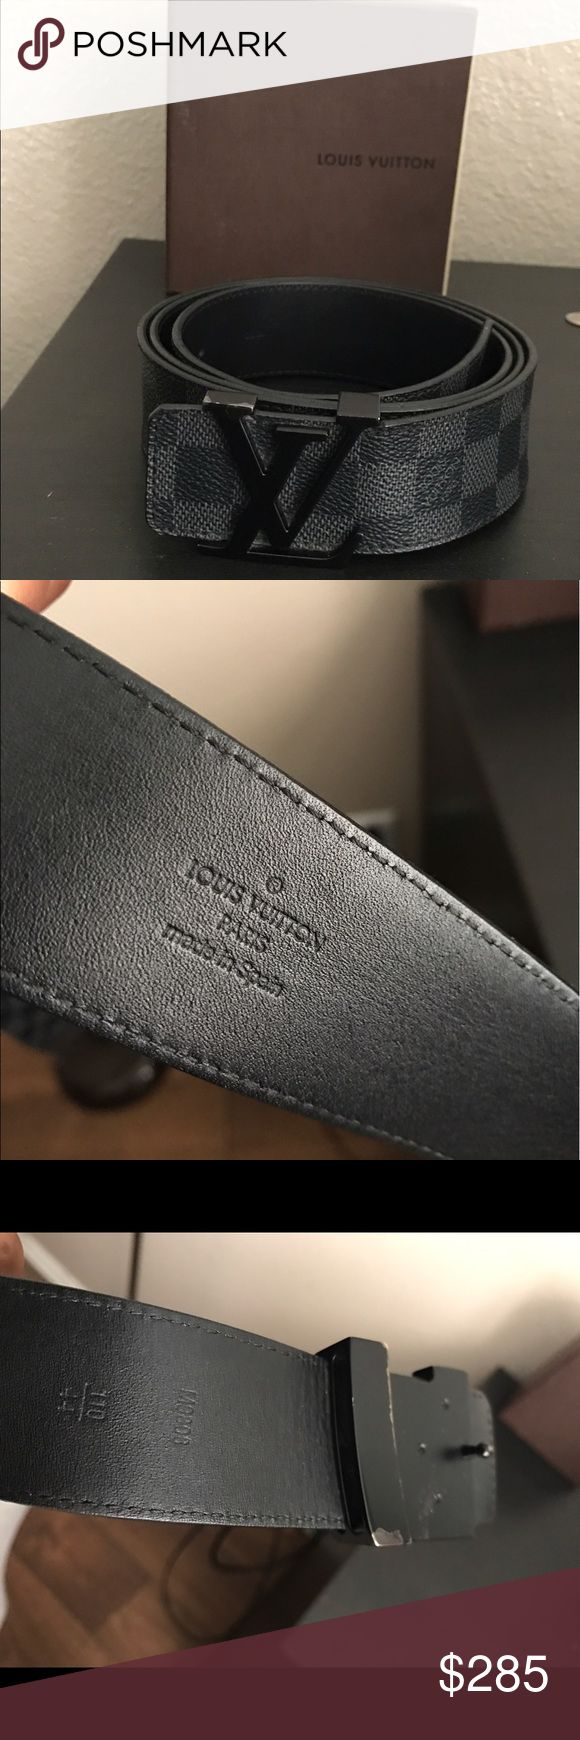 Louis Vuitton Belt LV Initiales 40mm Belt Size US44/110cm Black Damier belt. Belt has scratches on the LV buckle. 100% guaranteed authentic. Nubuck leather lining. Accessories Belts